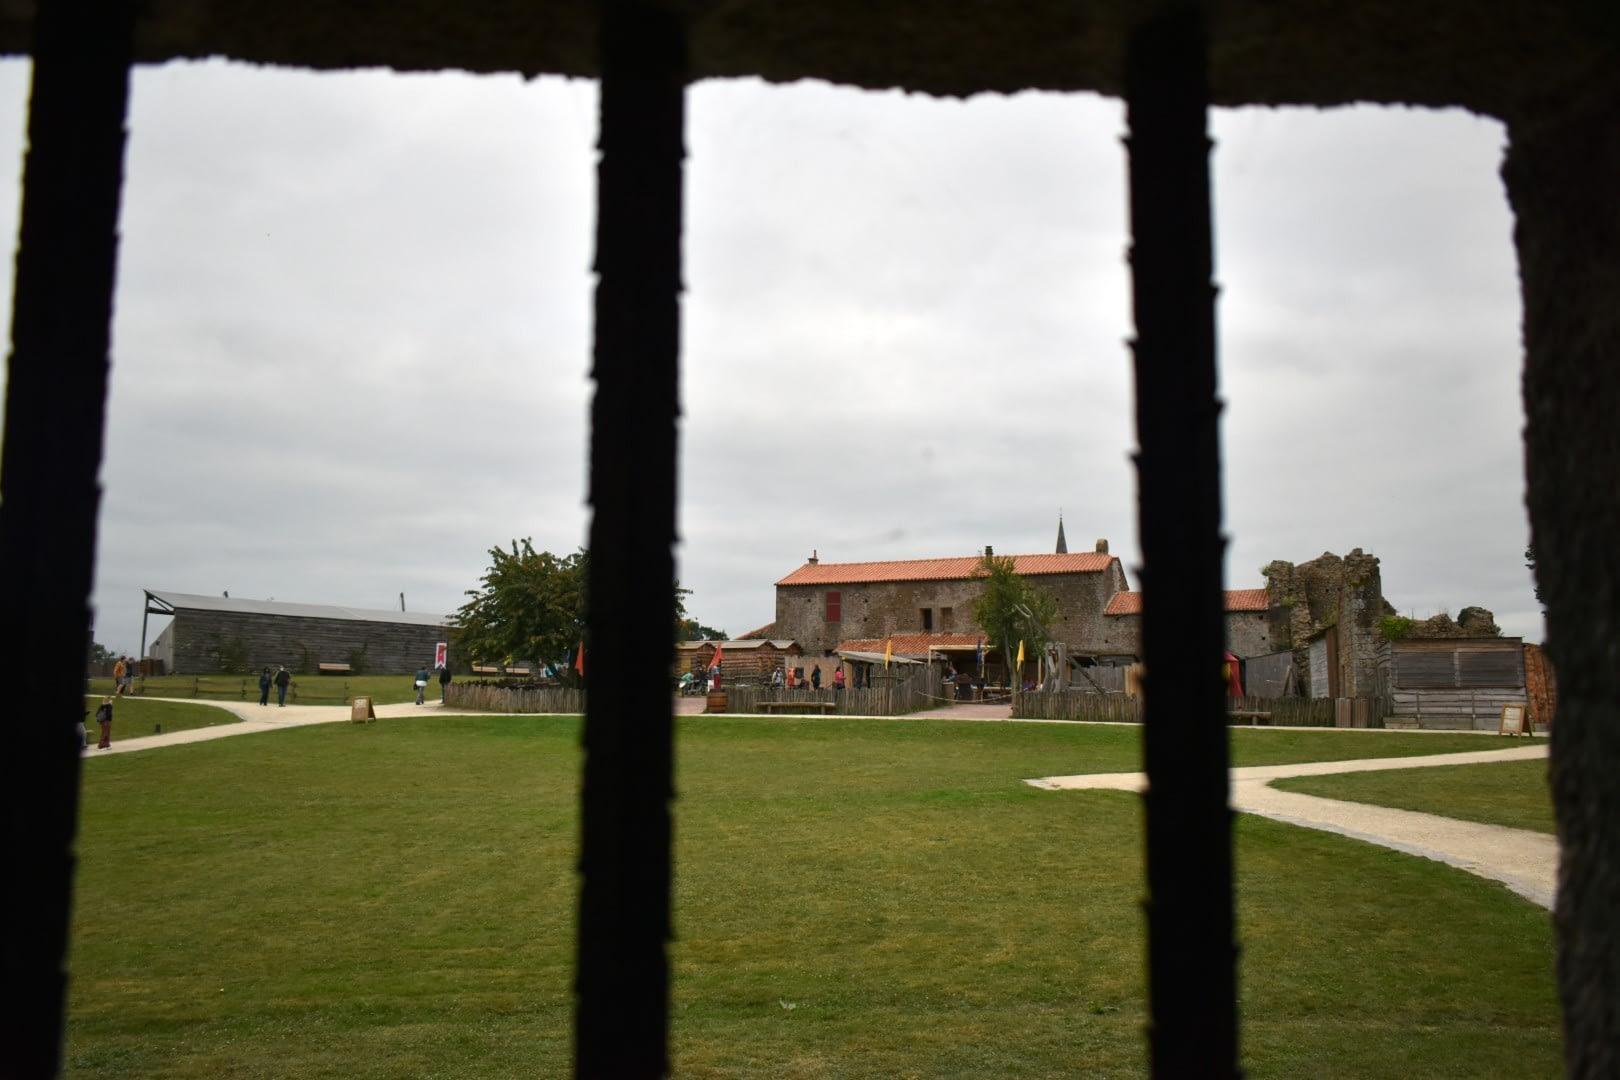 Château de Tiffauges, a medieval castle in Vendée